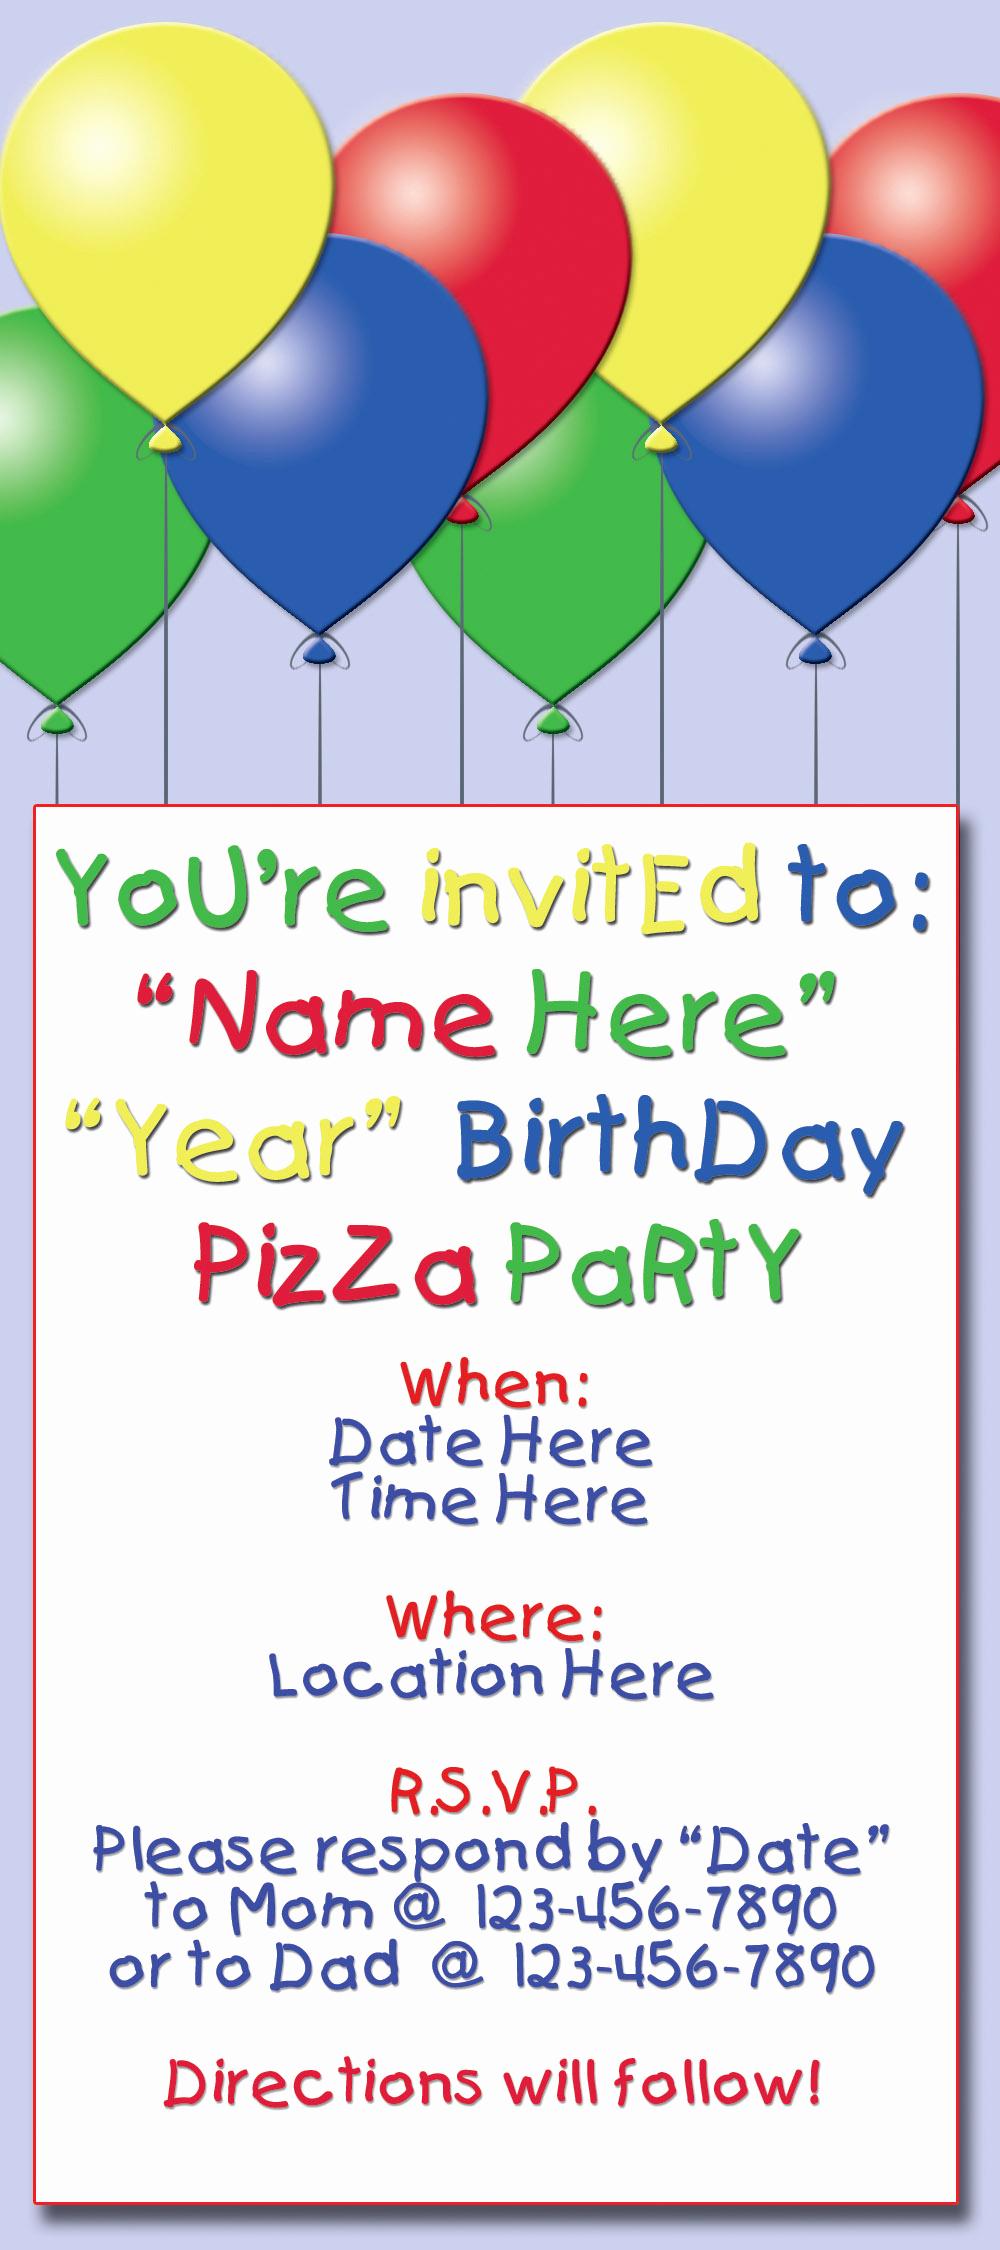 Sample Party Invitation Wording Fresh Birthday Party Invitation Sample